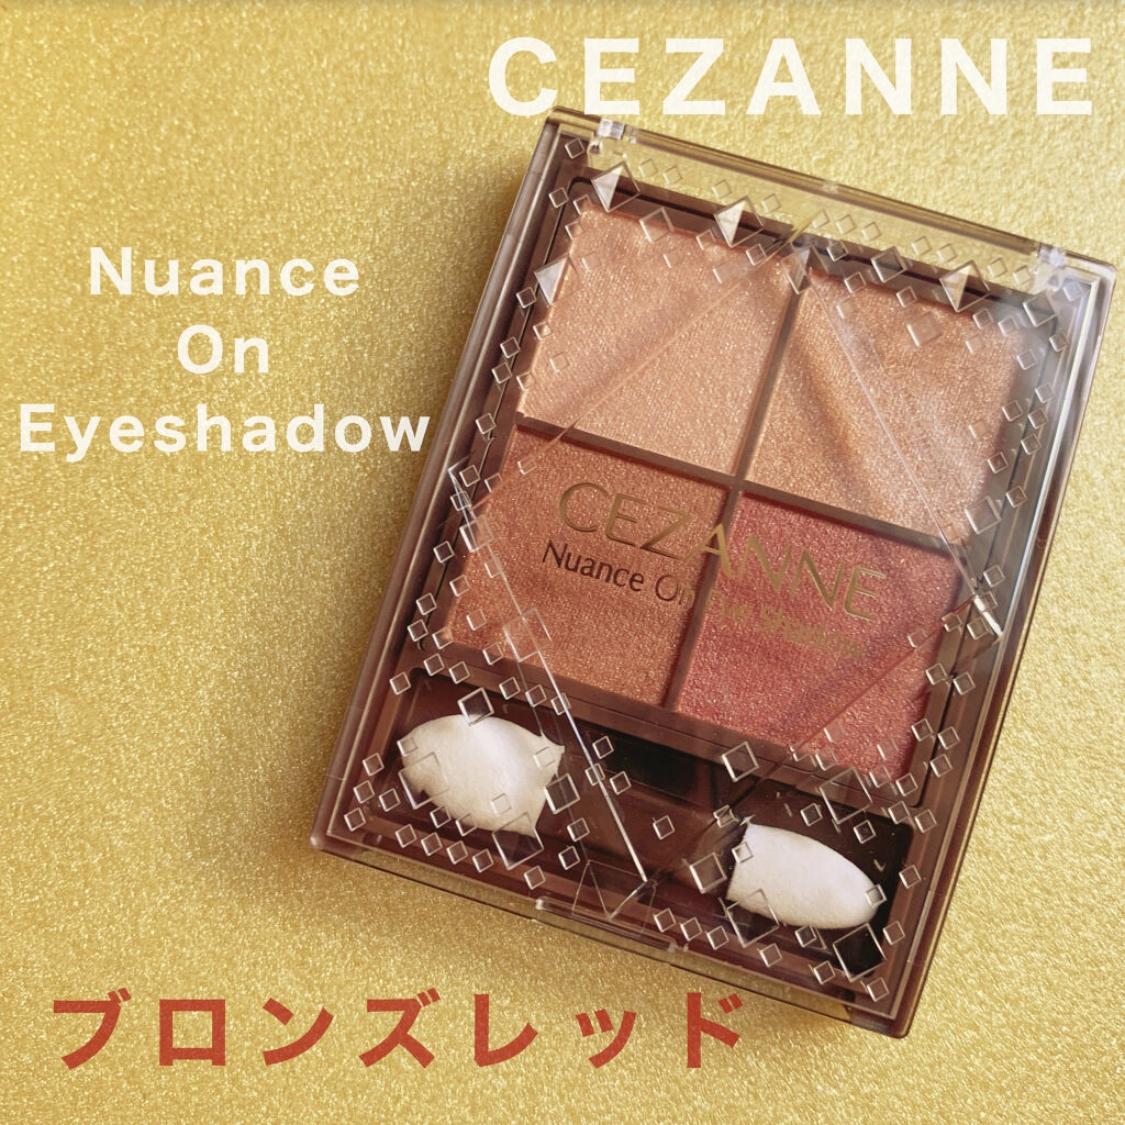 CEZANNE(セザンヌ) ニュアンスオンアイシャドウを使ったKeiさんのクチコミ画像1